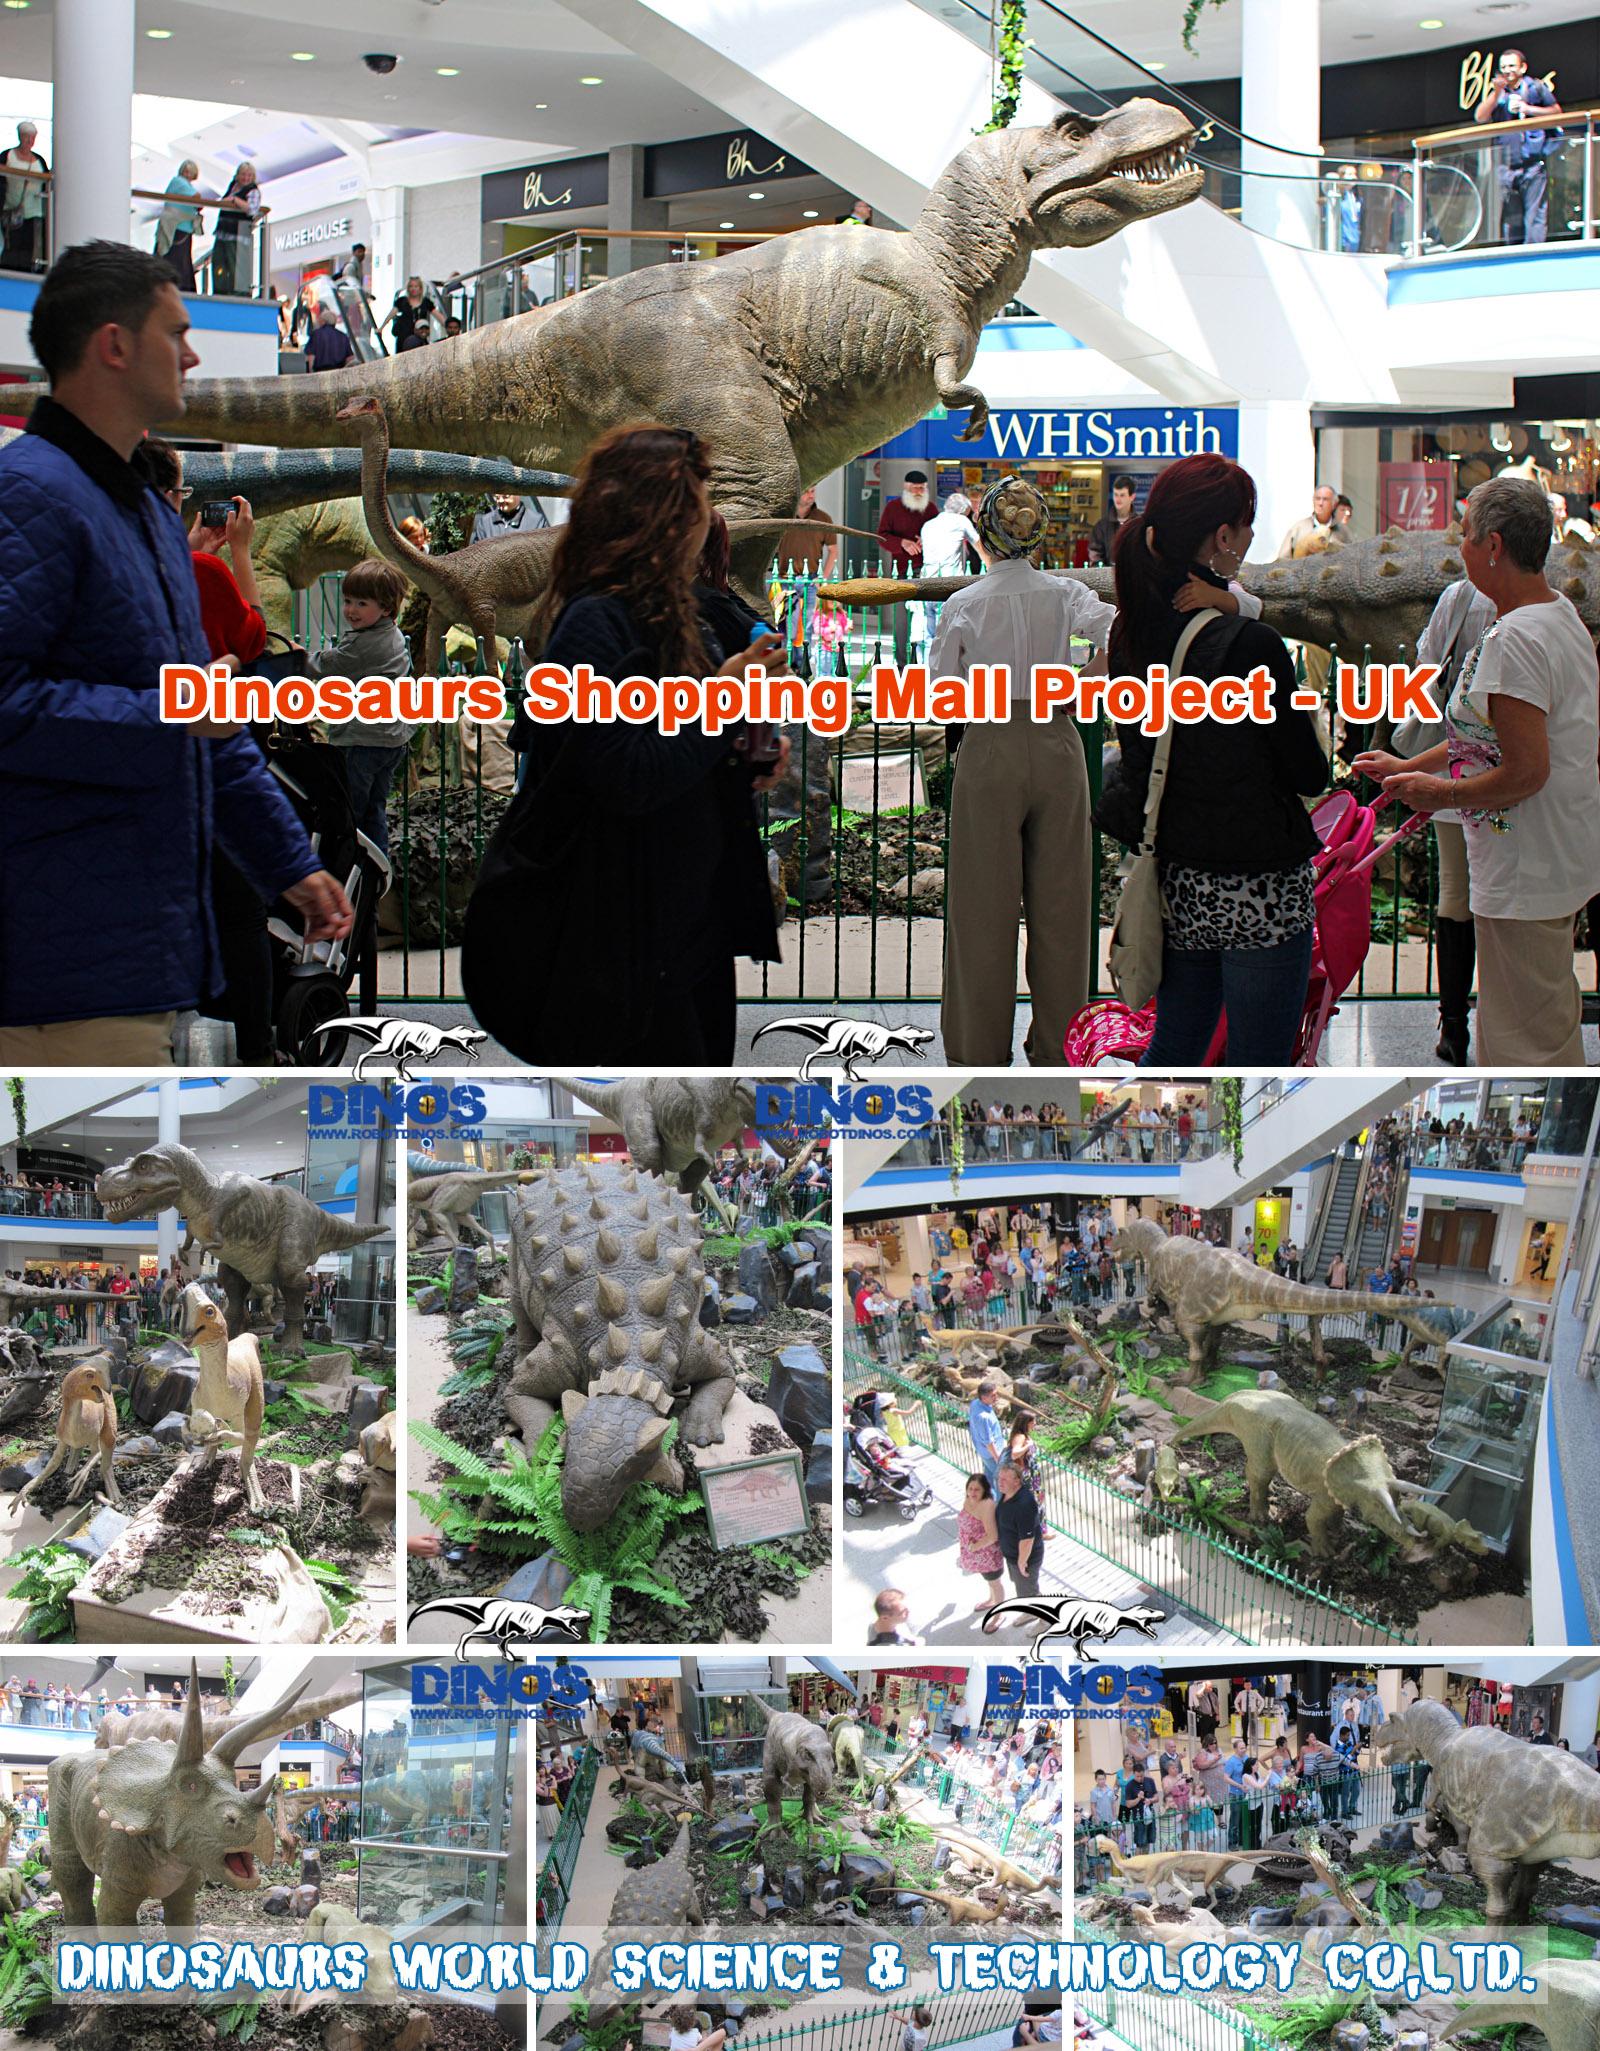 animatronic dinosaurs,shopping mall attraction dinosaurs,dinosaurs event show ,dinosaurs attraction,jurassic park dinosaurs